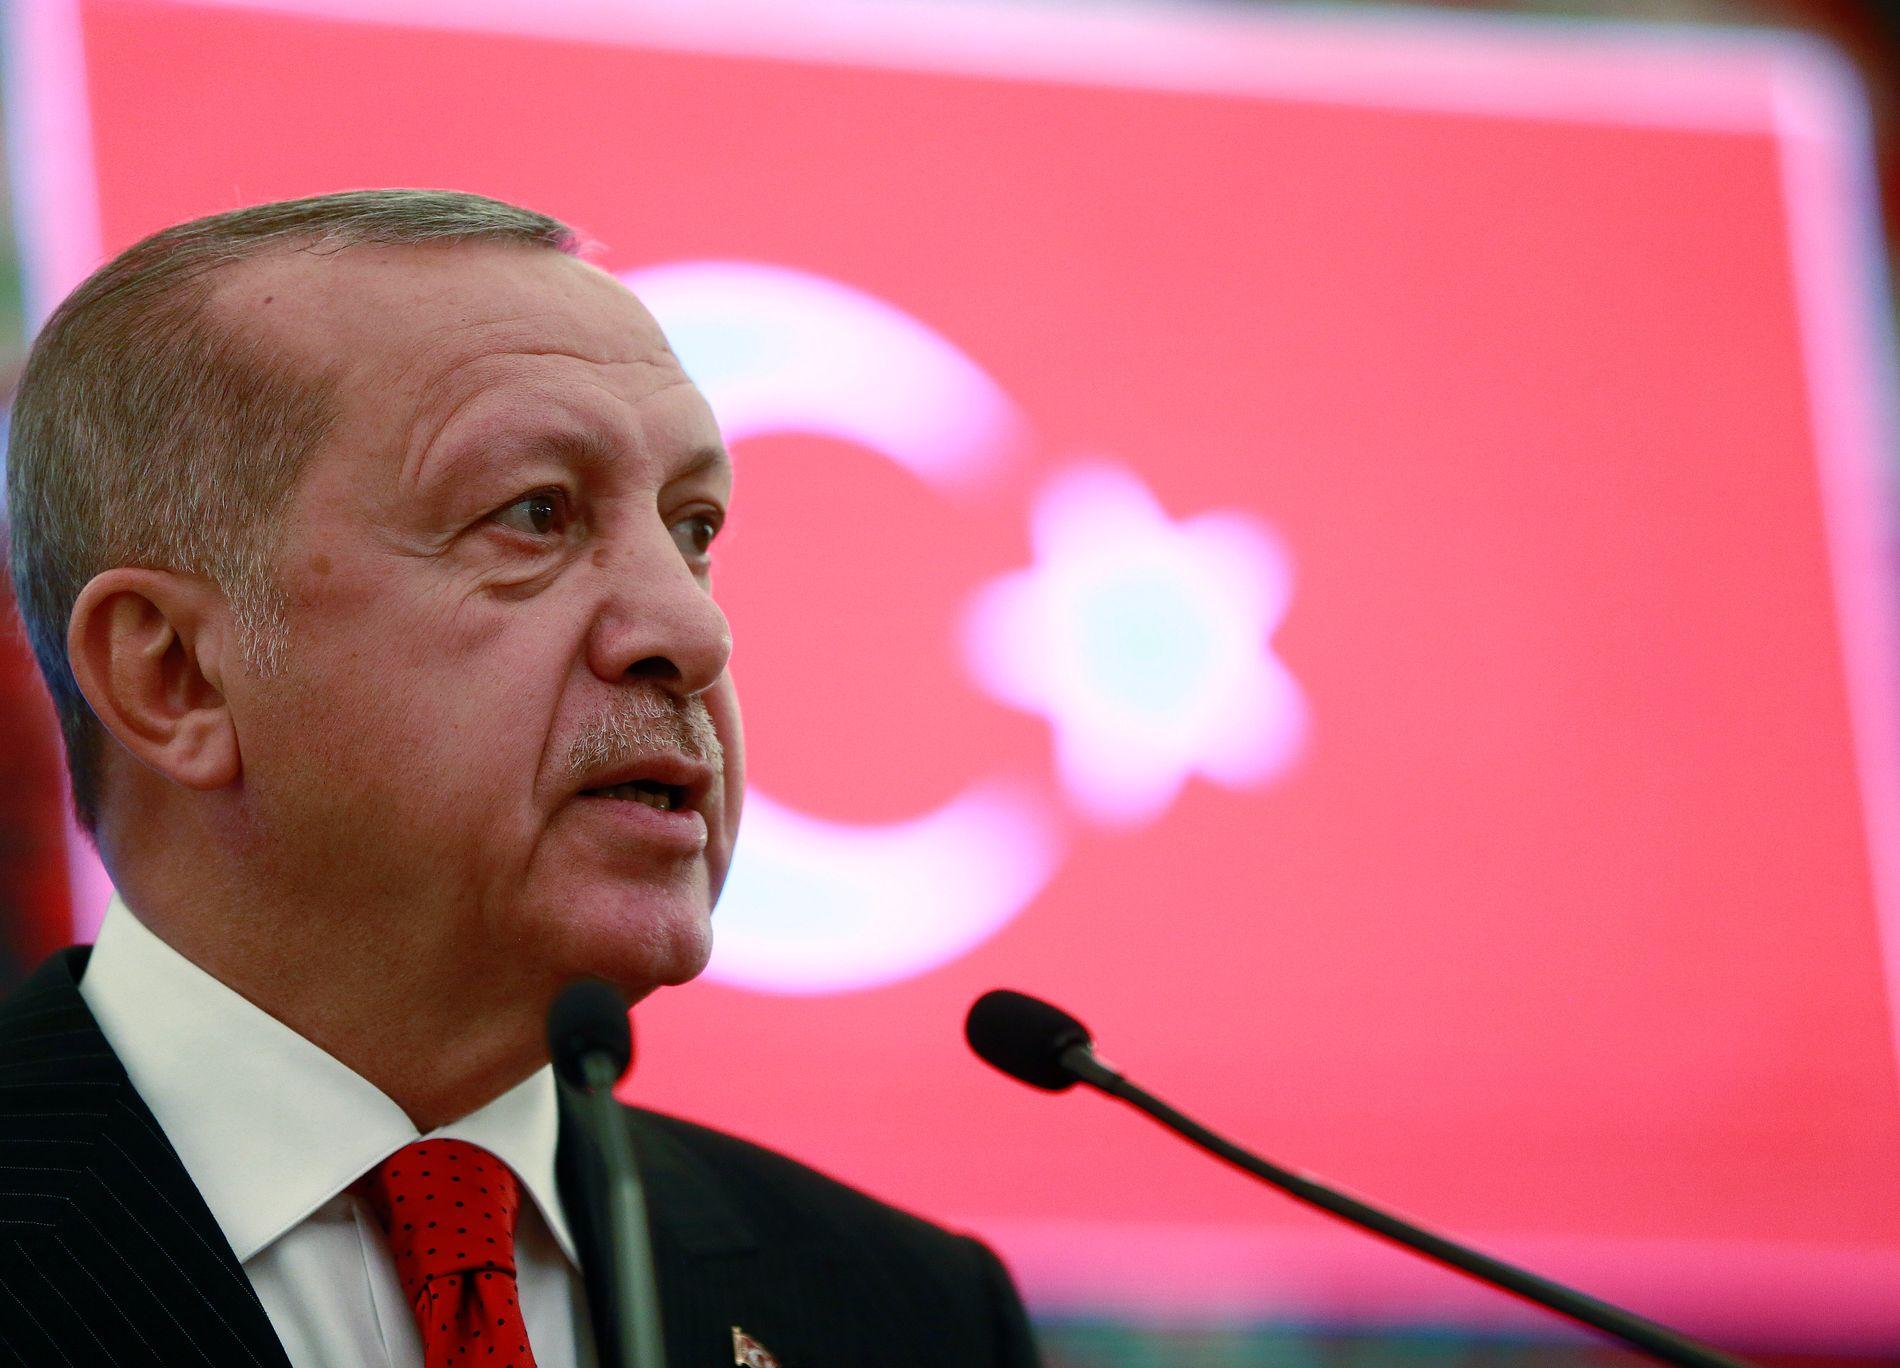 FÅR OMKAMP: President Recep Tayyip Erdogan nekter å godta at hans parti tapte valget i Istanbul.